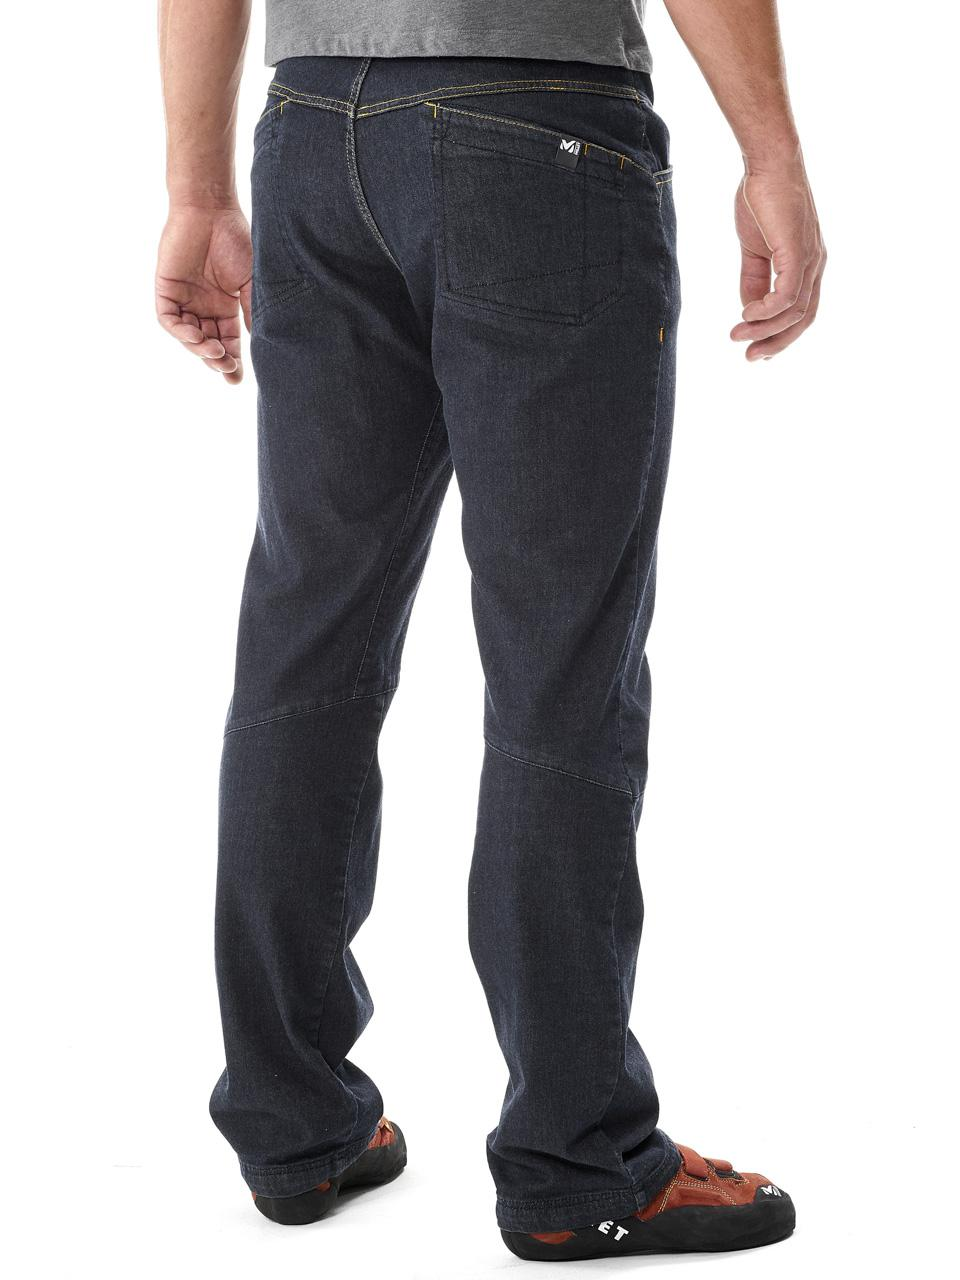 Hose-Jeans-Millet-Karambony-Hose-Denim-Dunkel-Blau-15043-Neu Indexbild 2